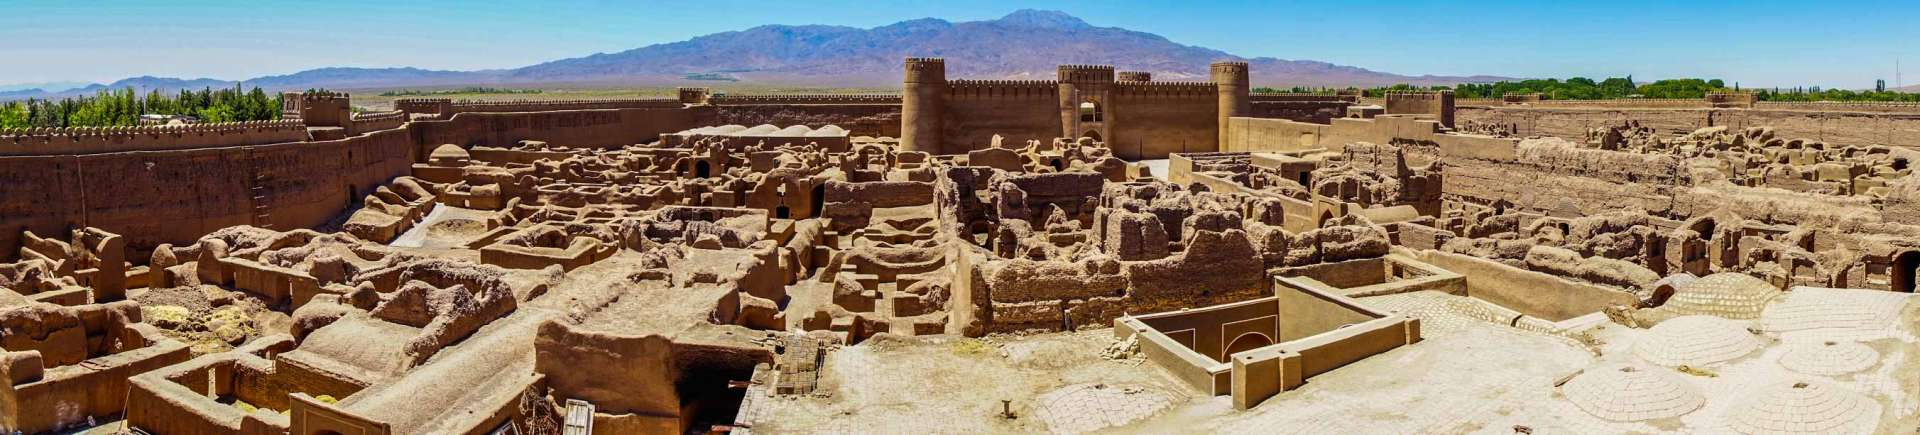 Rayen citadel 2